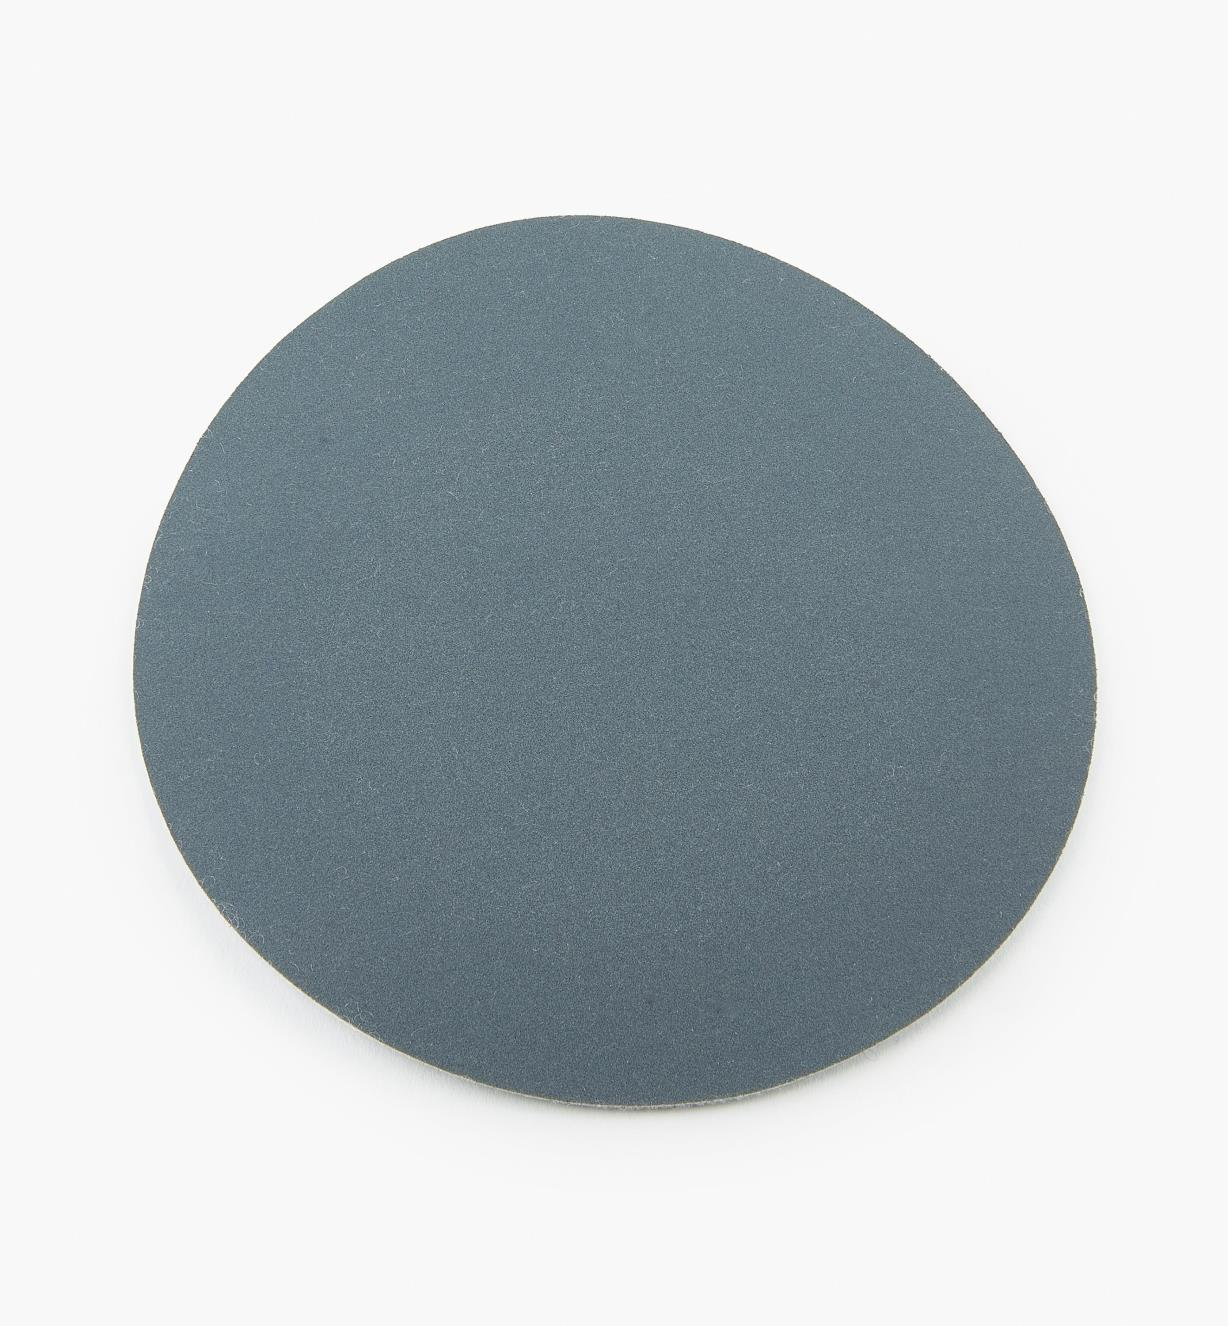 54K9033 - 3200x Micro-Mesh Disc, ea.